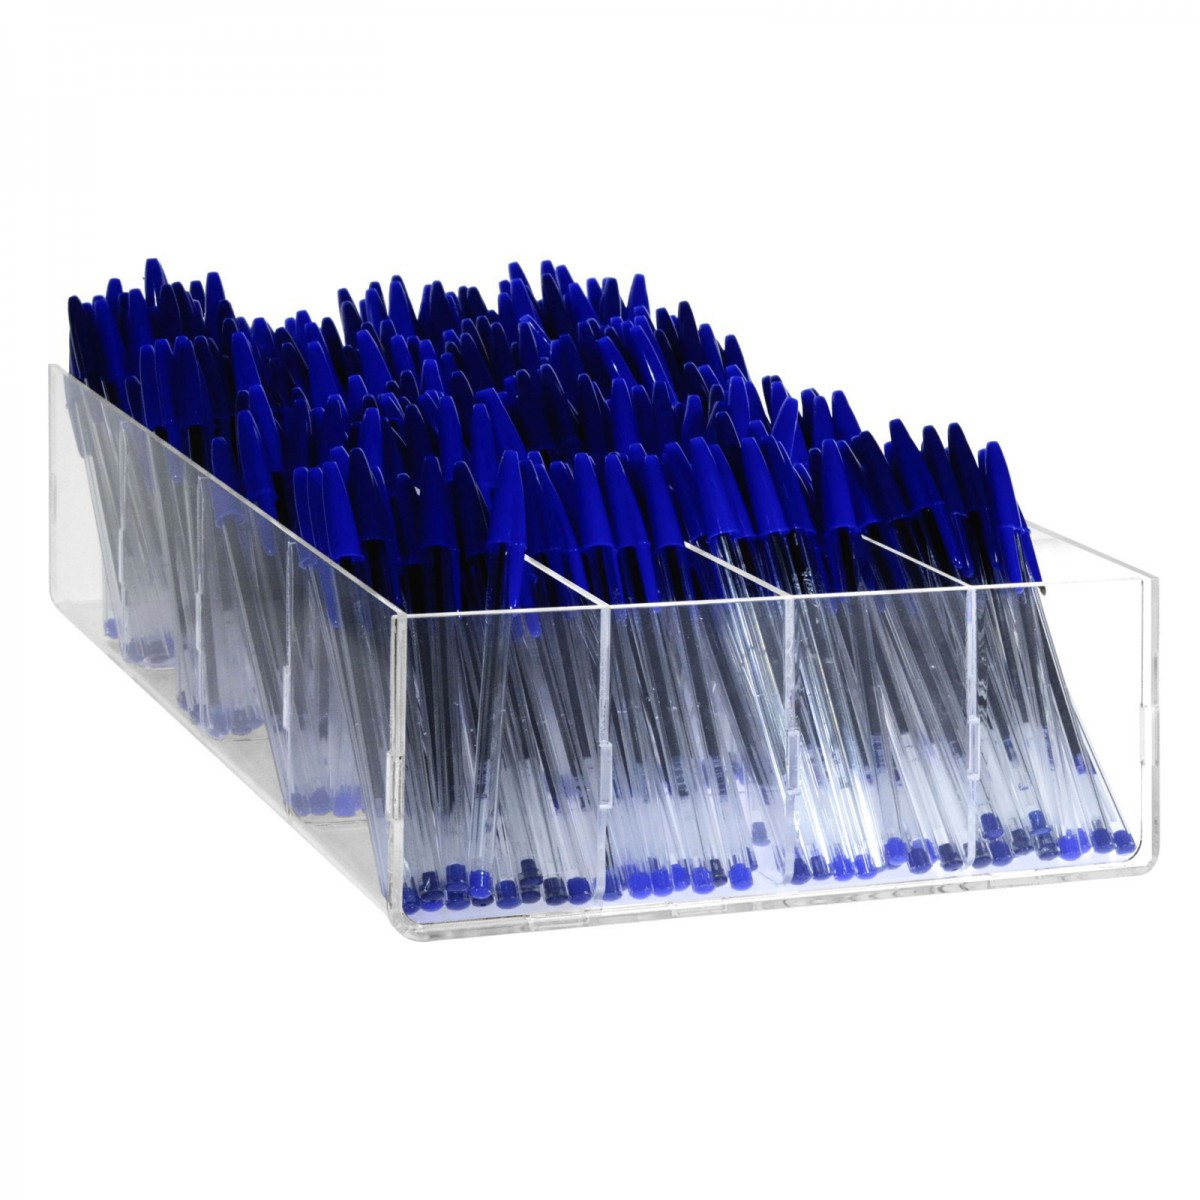 Plexiglass trasparente   misure: 50 x 40 x h50 cm